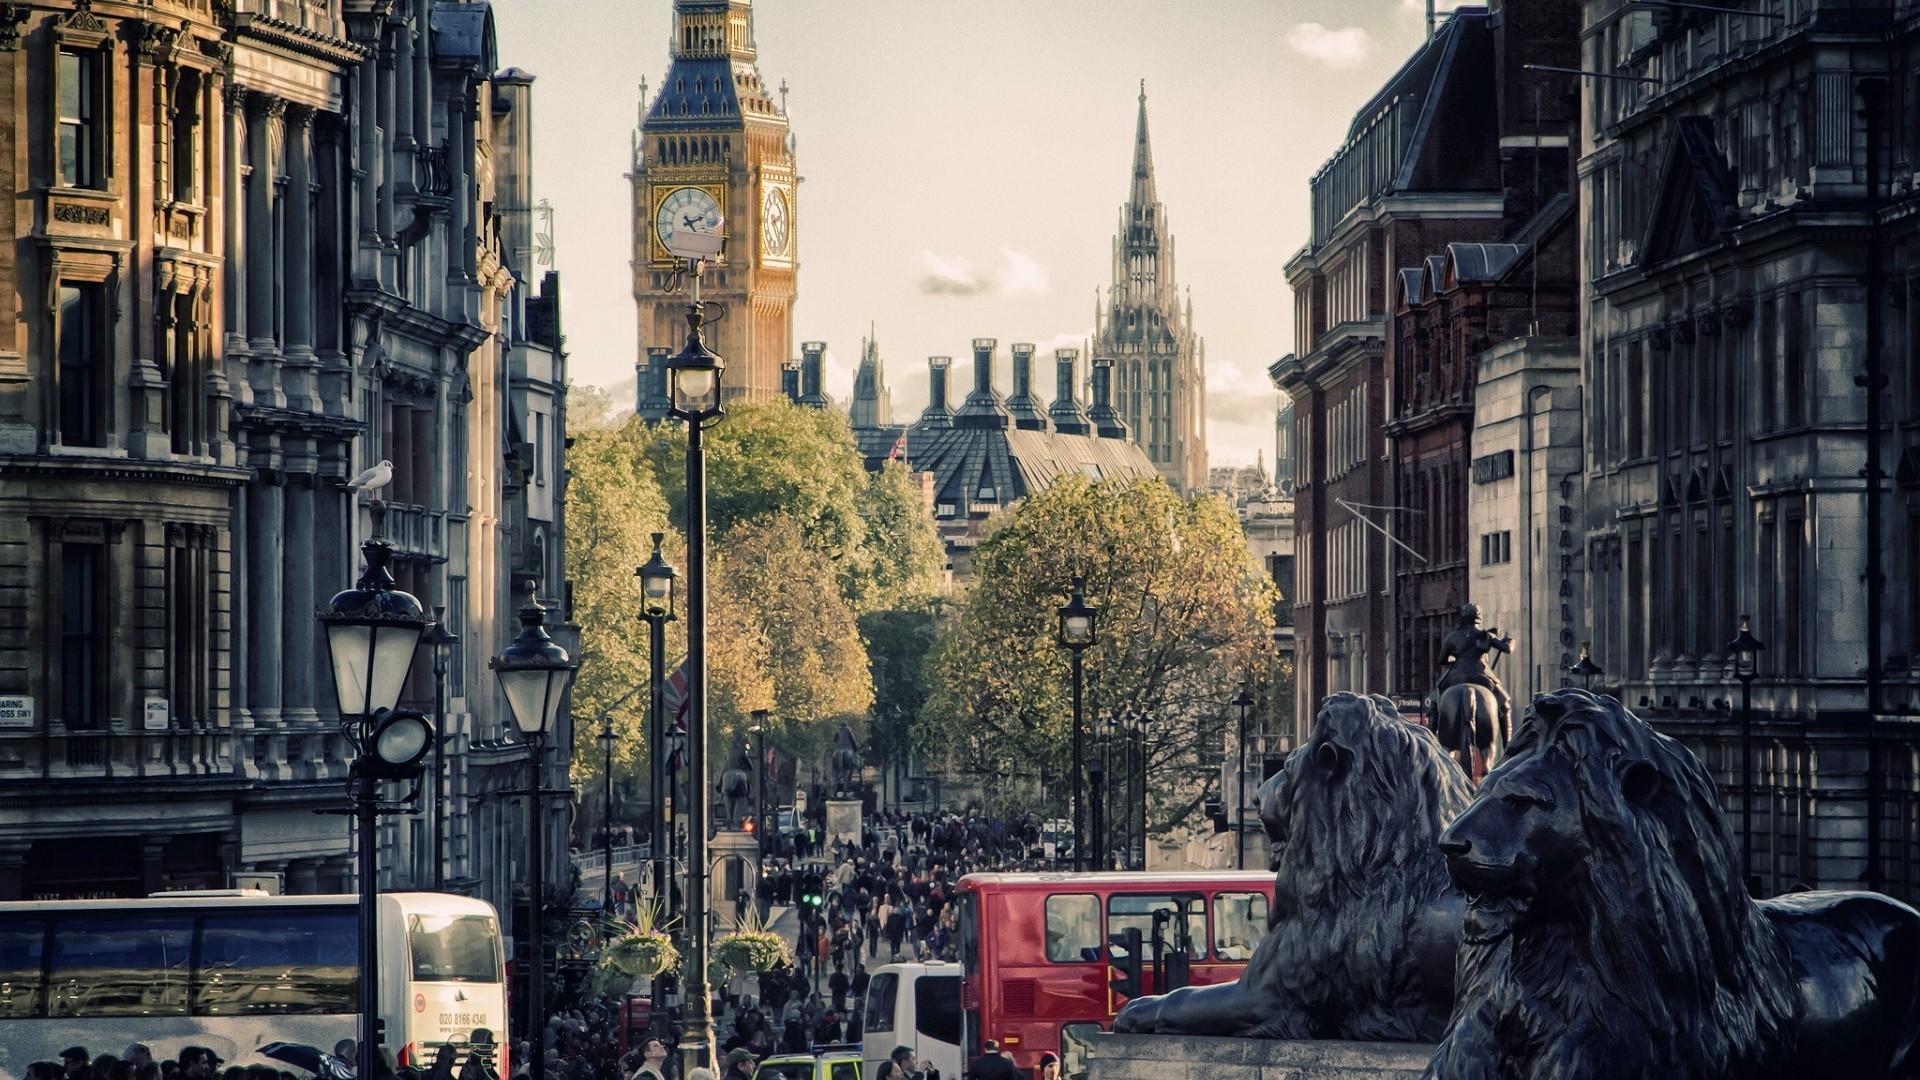 England London Big Ben United Kingdom Wallpaper   MixHD wallpapers 1920x1080